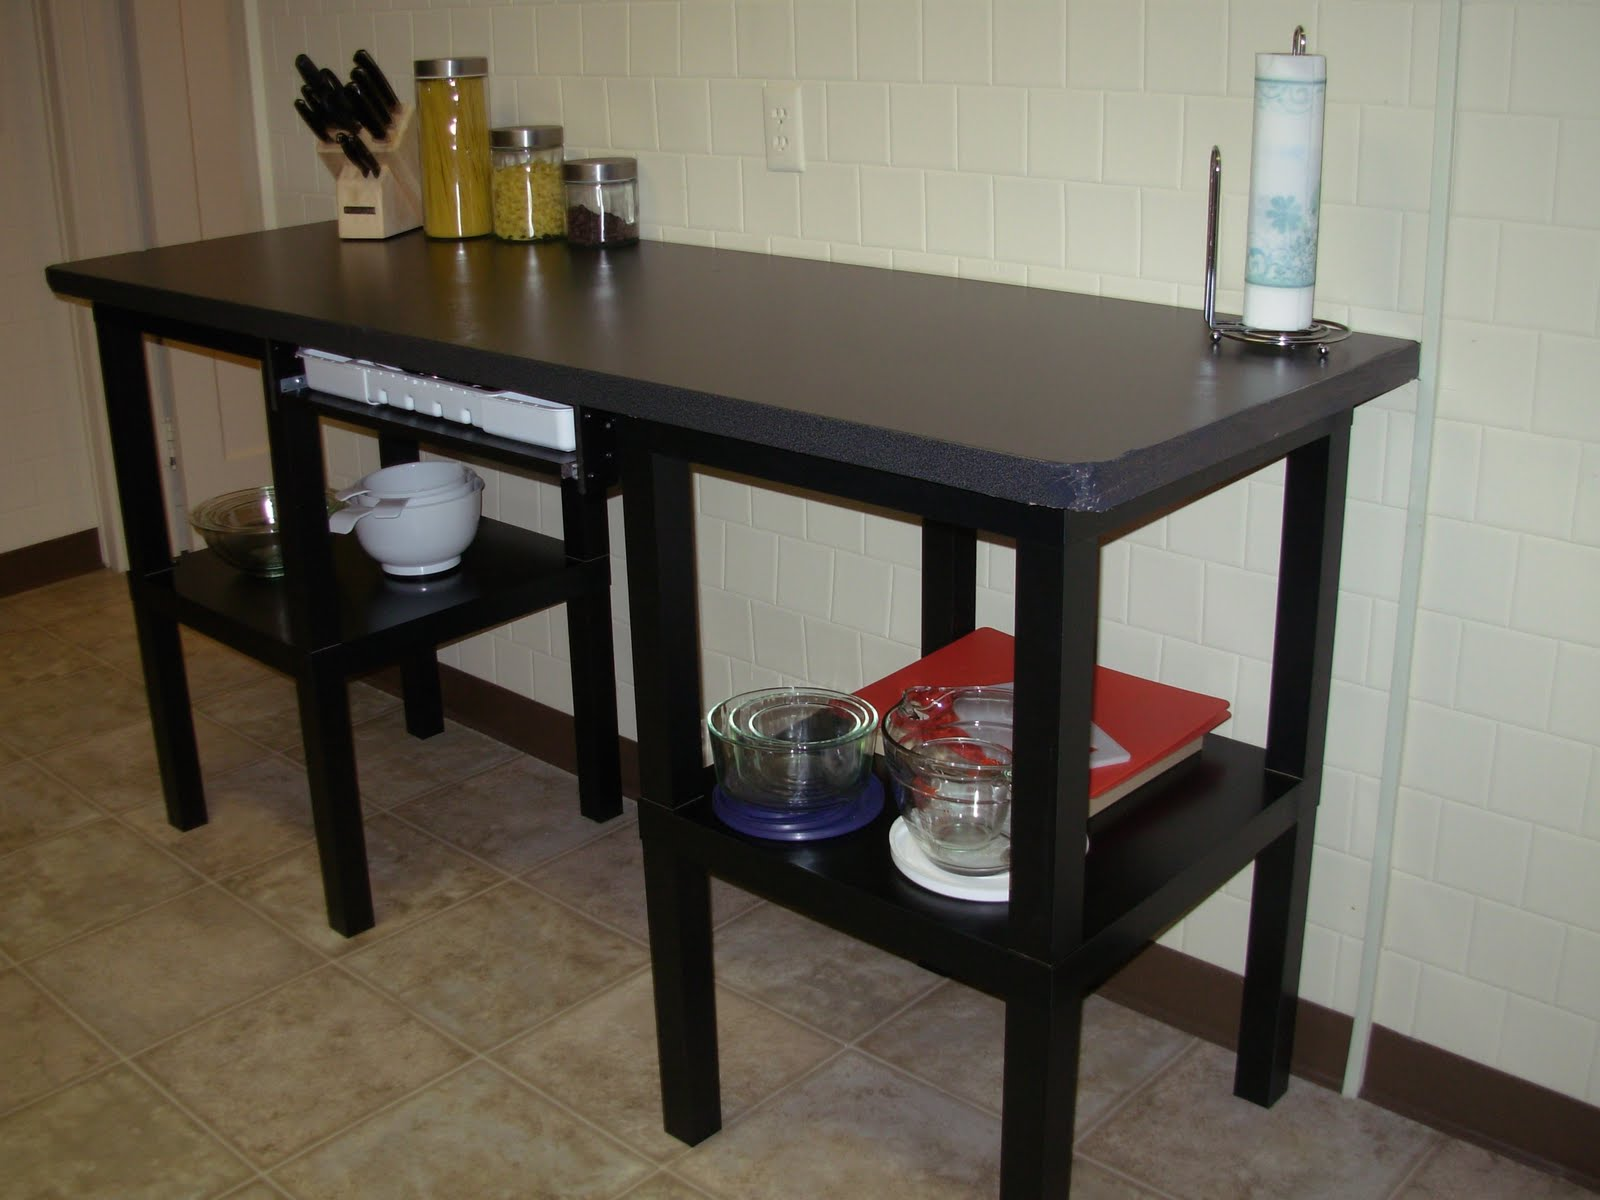 Kitchen work station IKEA Hackers IKEA Hackers